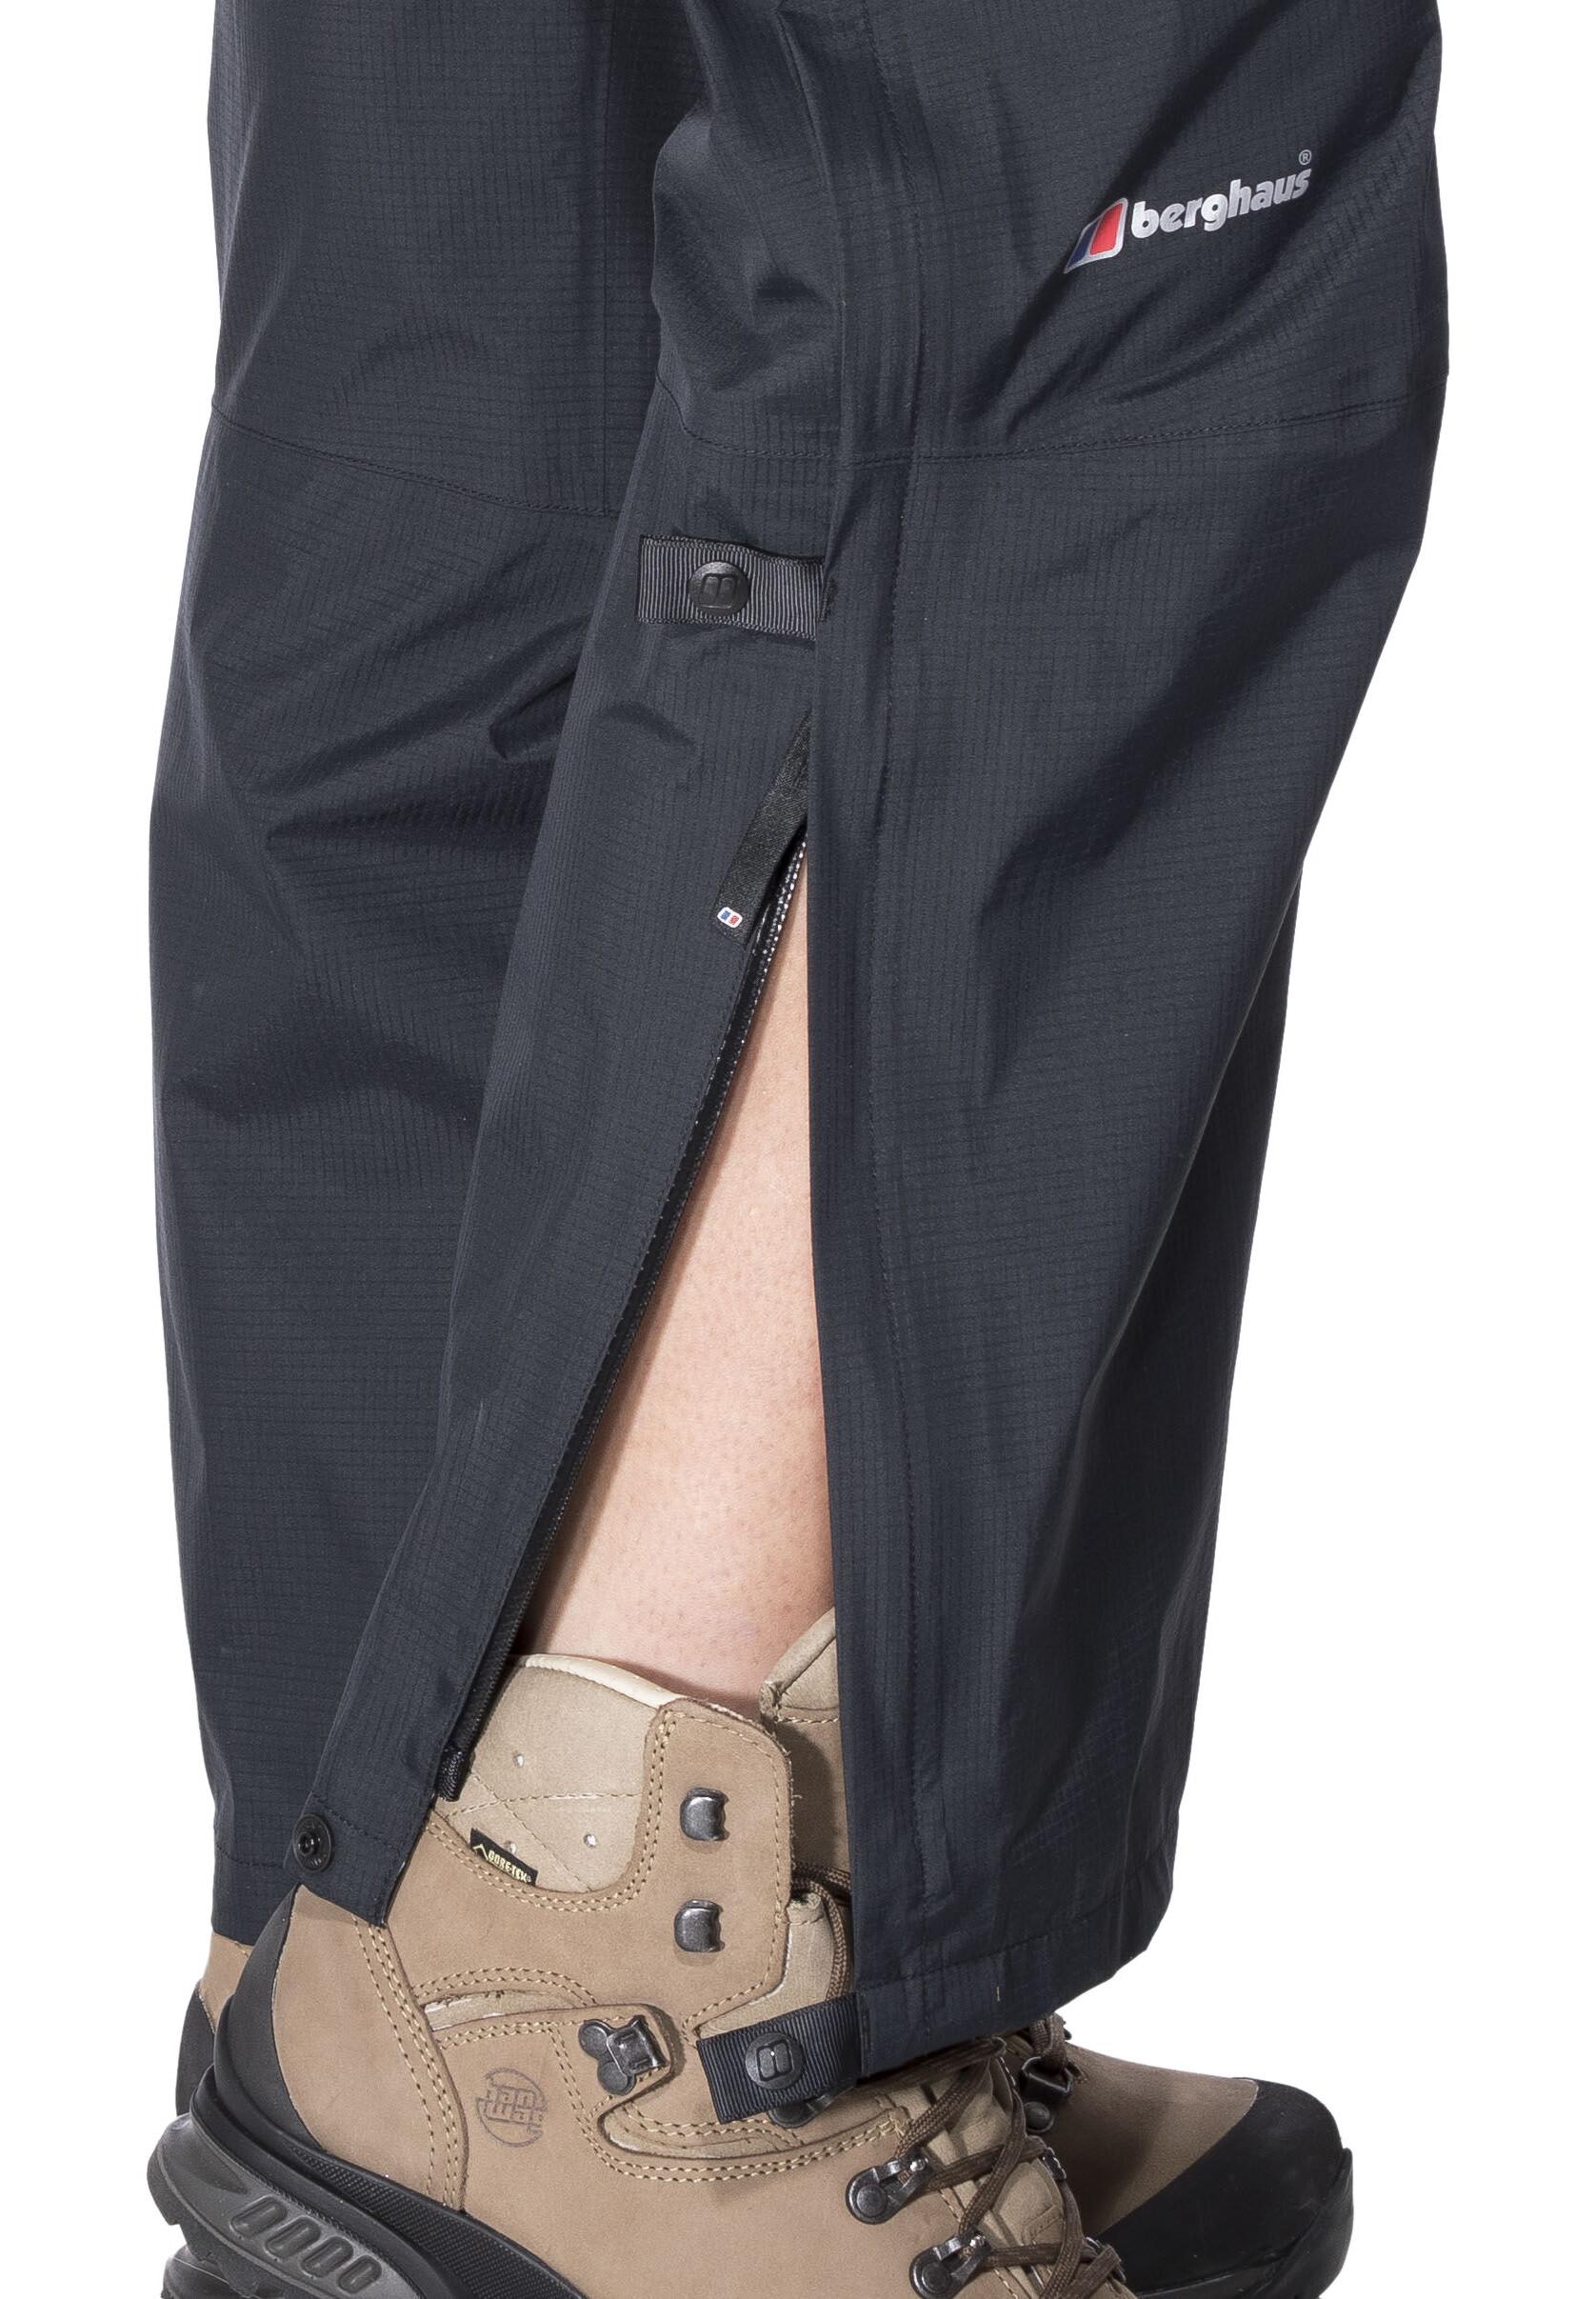 Berghaus Men's GORE-TEX Paclite Pant (33 Leg) | Nevisport